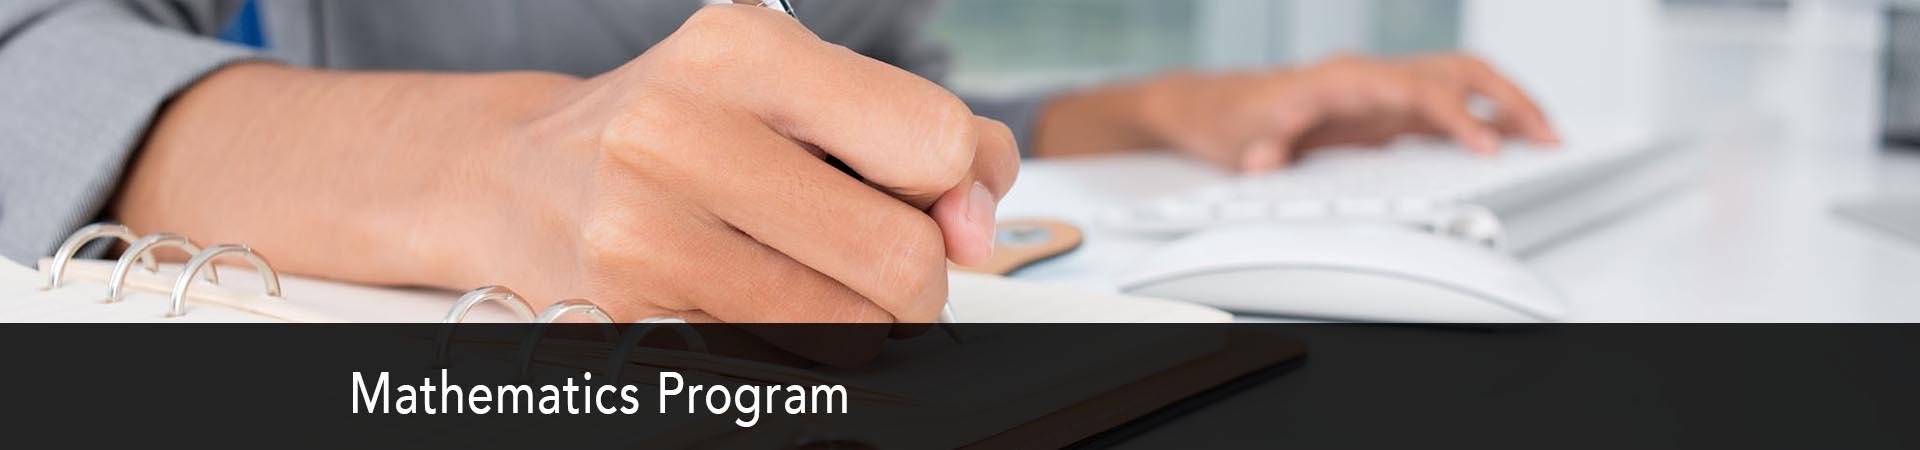 Explore the Mathematics Program at NC